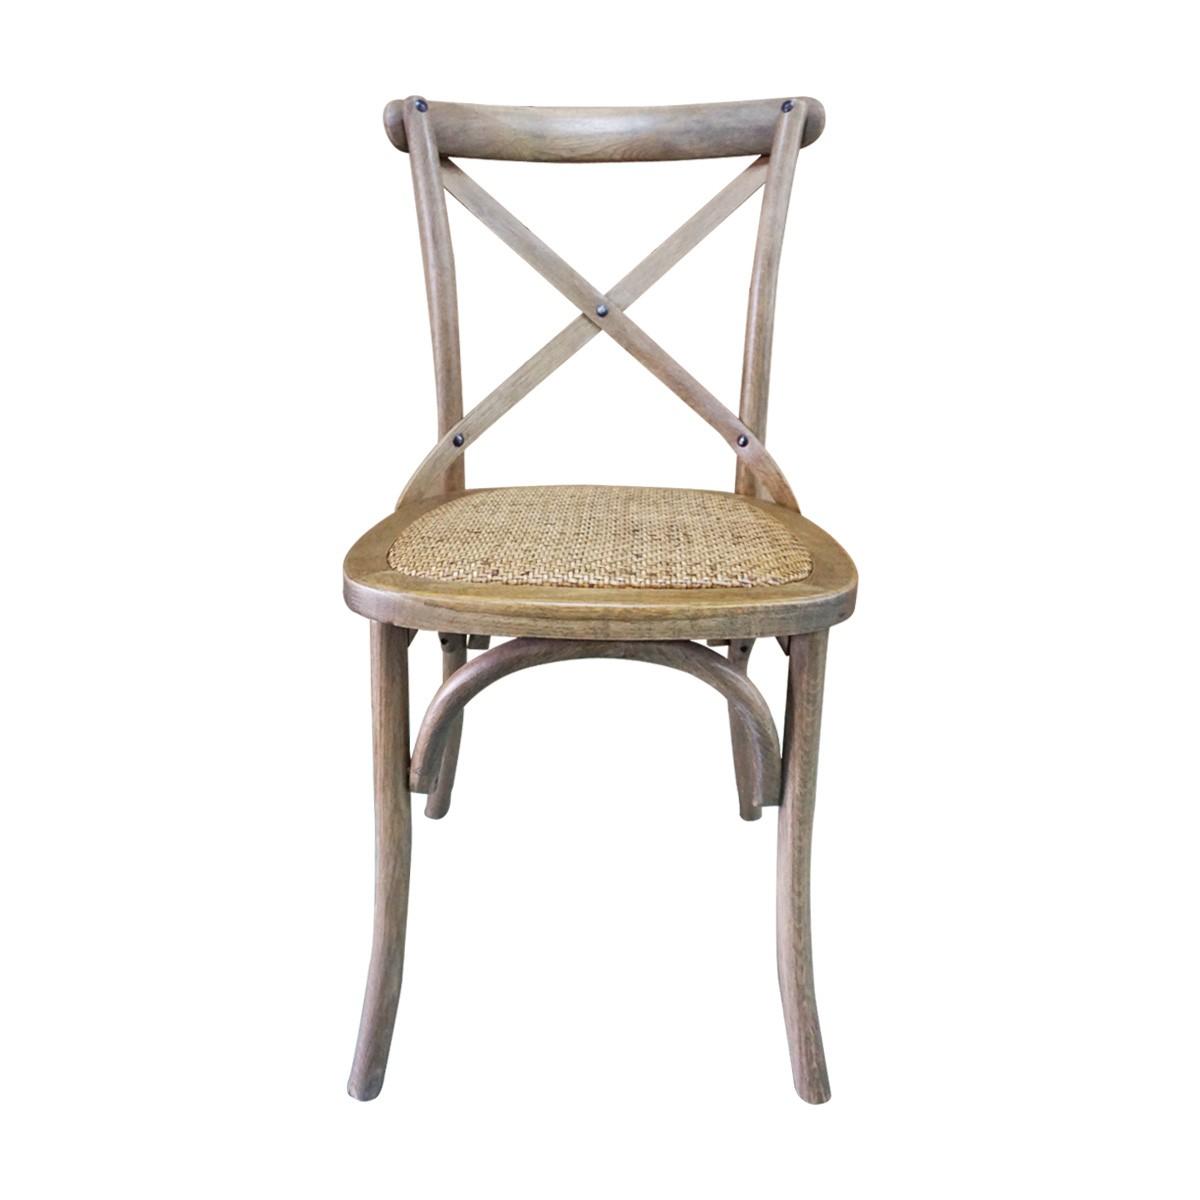 Hamptons cross back dining chair birch american oak rattan seat